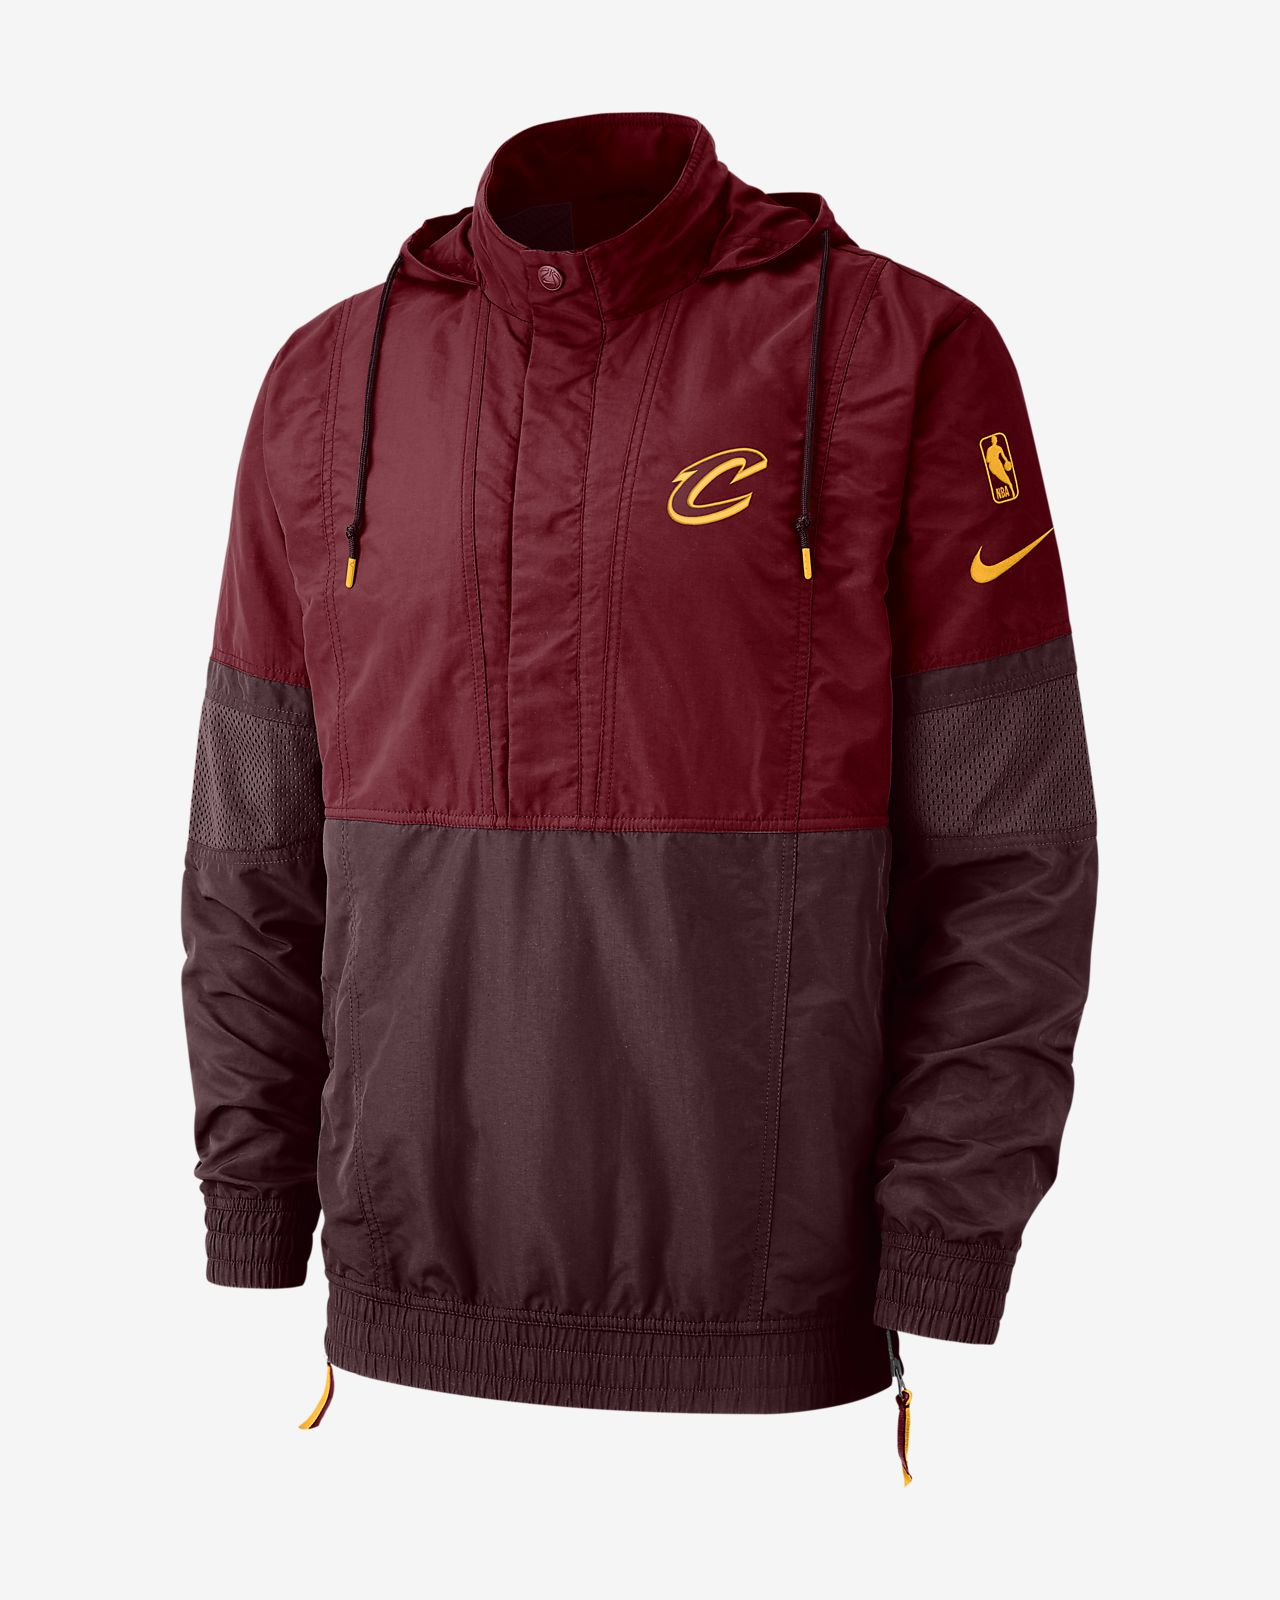 Cleveland Cavaliers Nike Courtside Men's Hooded NBA Jacket